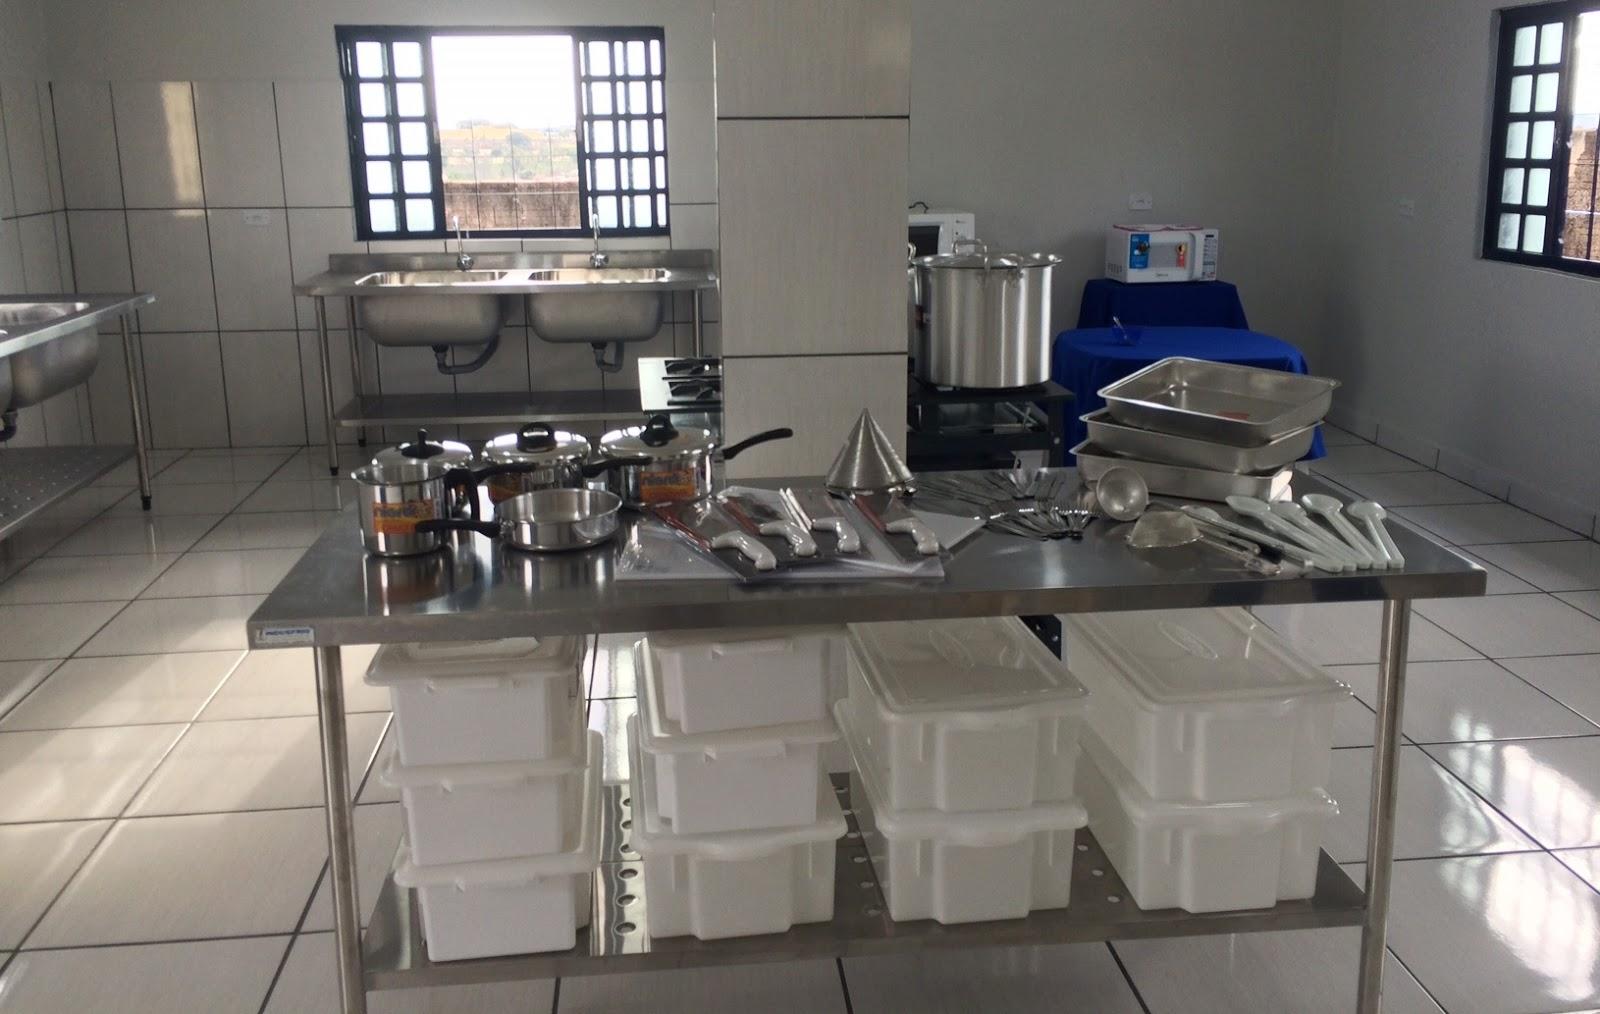 Mari De S Caesmi Inaugura Cozinha Industrial